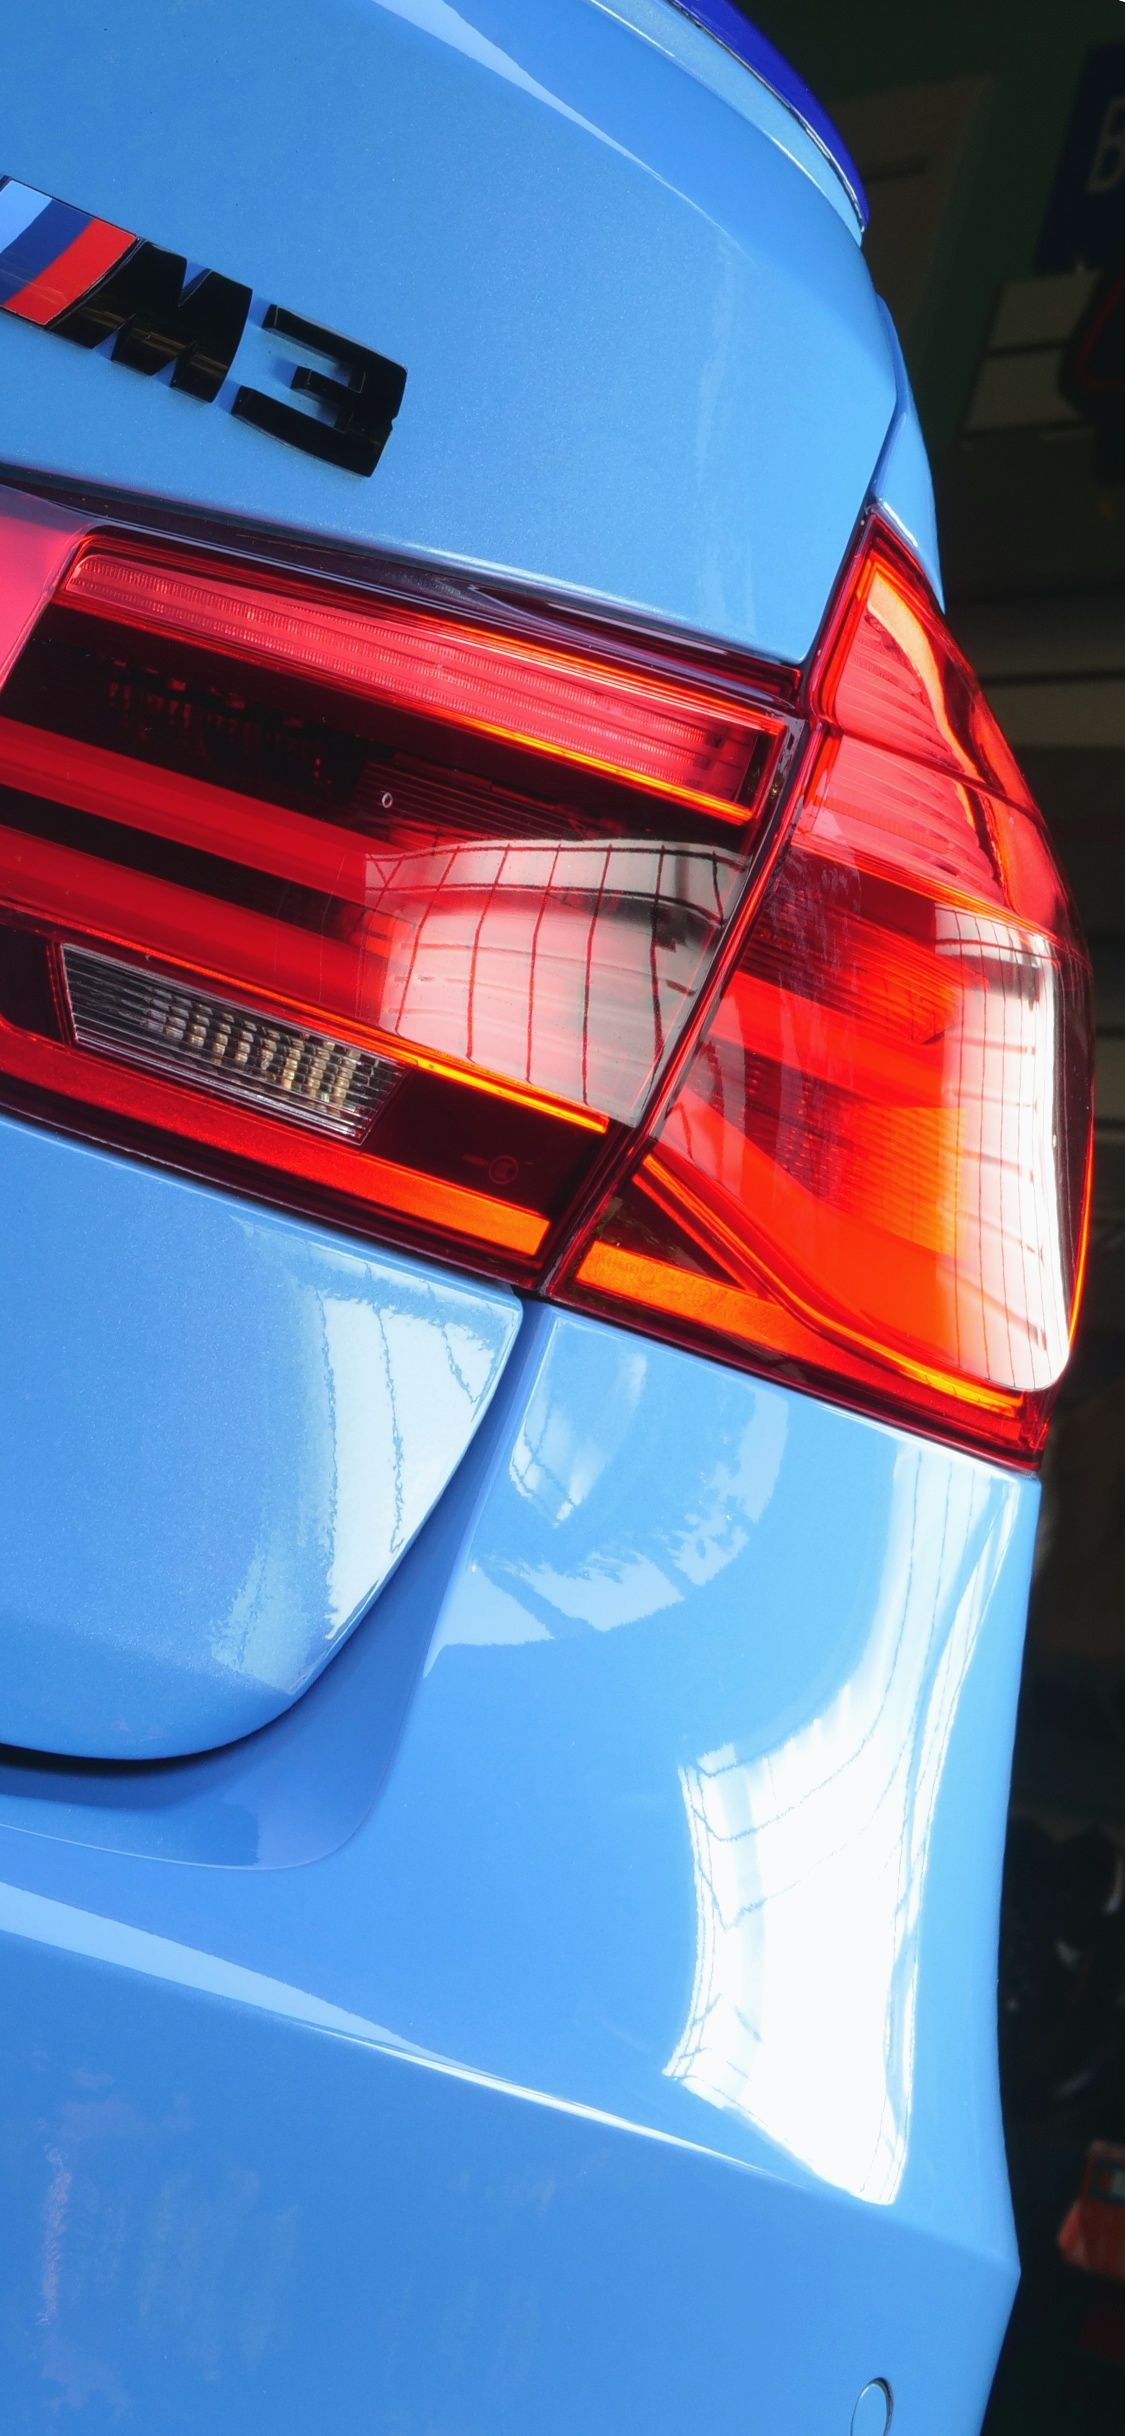 Blue BMW F80 M3 Iphone X Wallpapers Album on Imgur Bilder